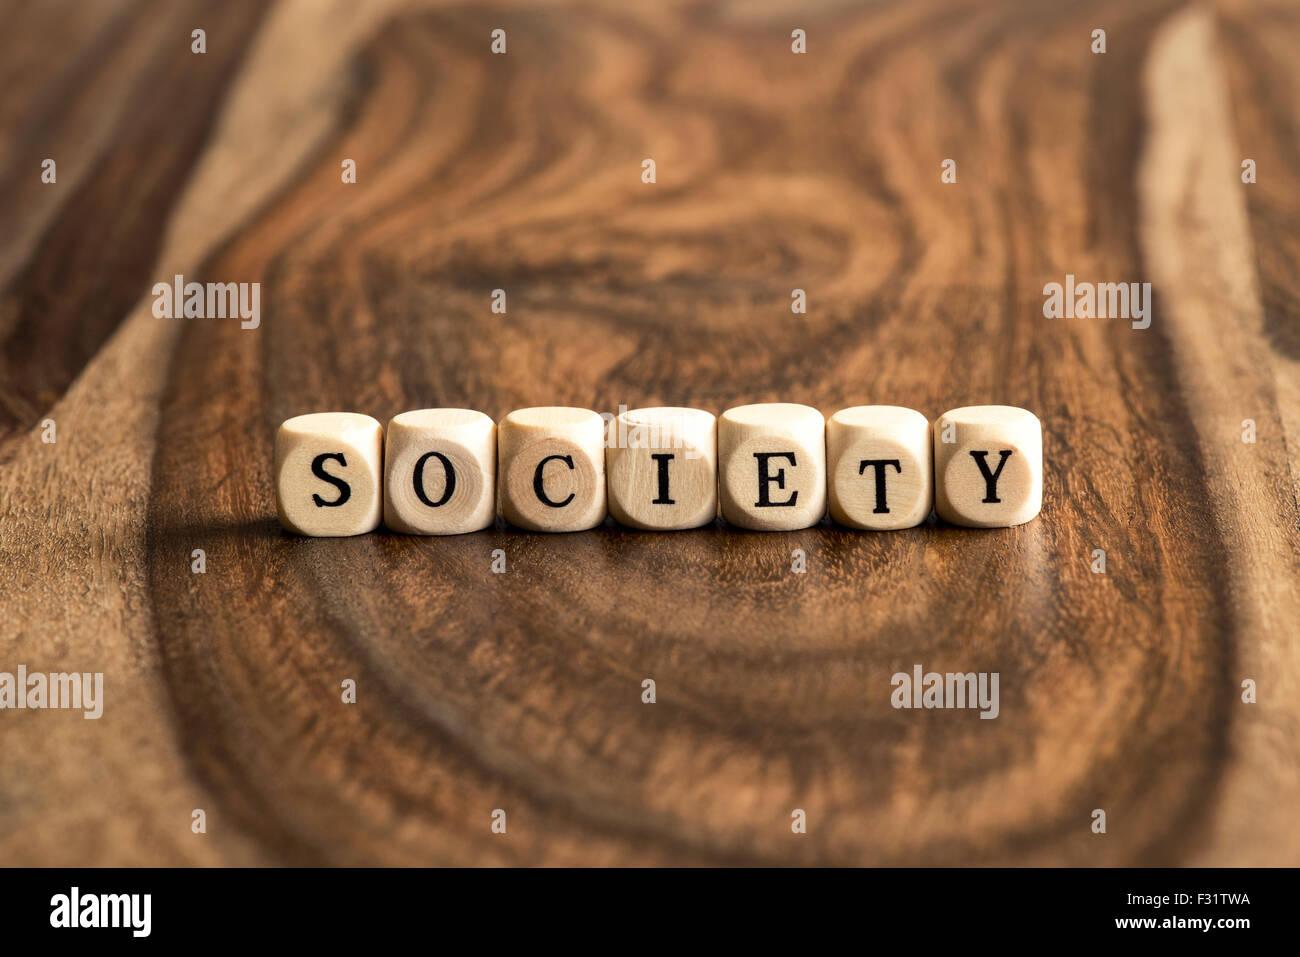 Gesellschaft-Word-Hintergrund auf Holzblöcke Stockbild